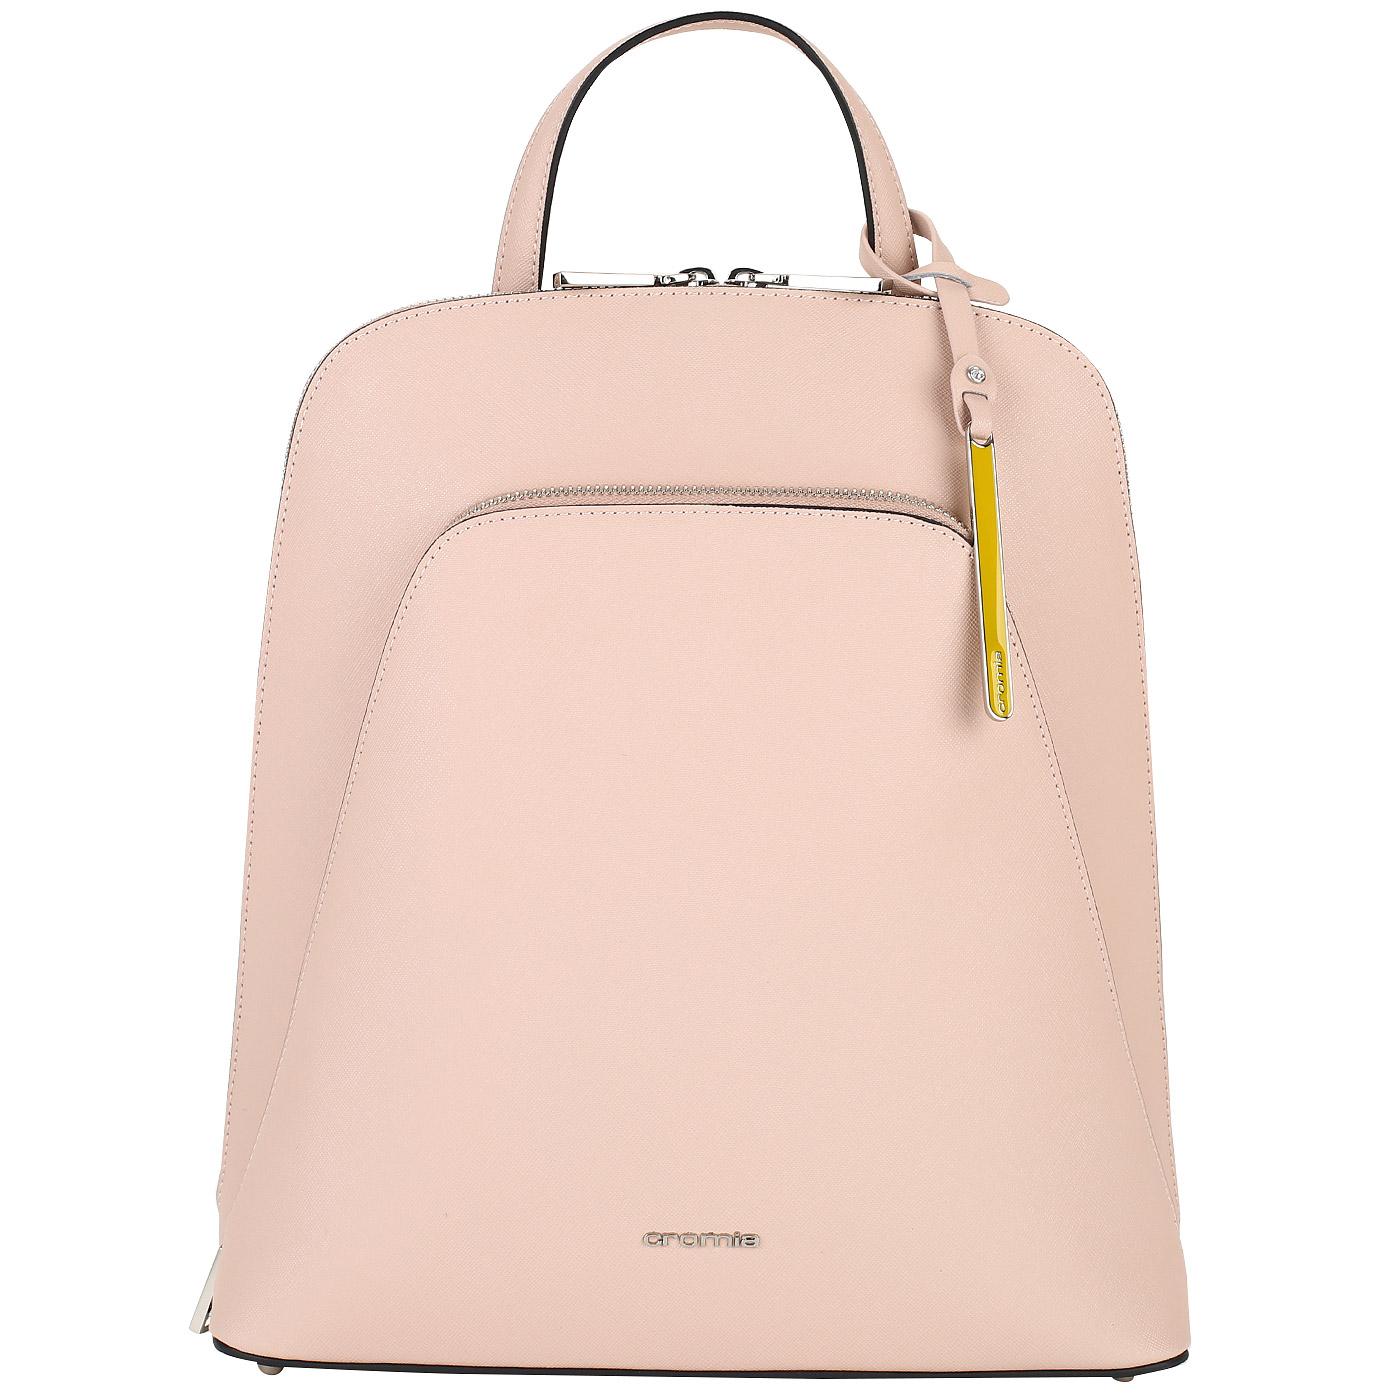 860efc49d440 Женский рюкзак из сафьяна Cromia Perla 1403603_rosa - 2000557793996 ...